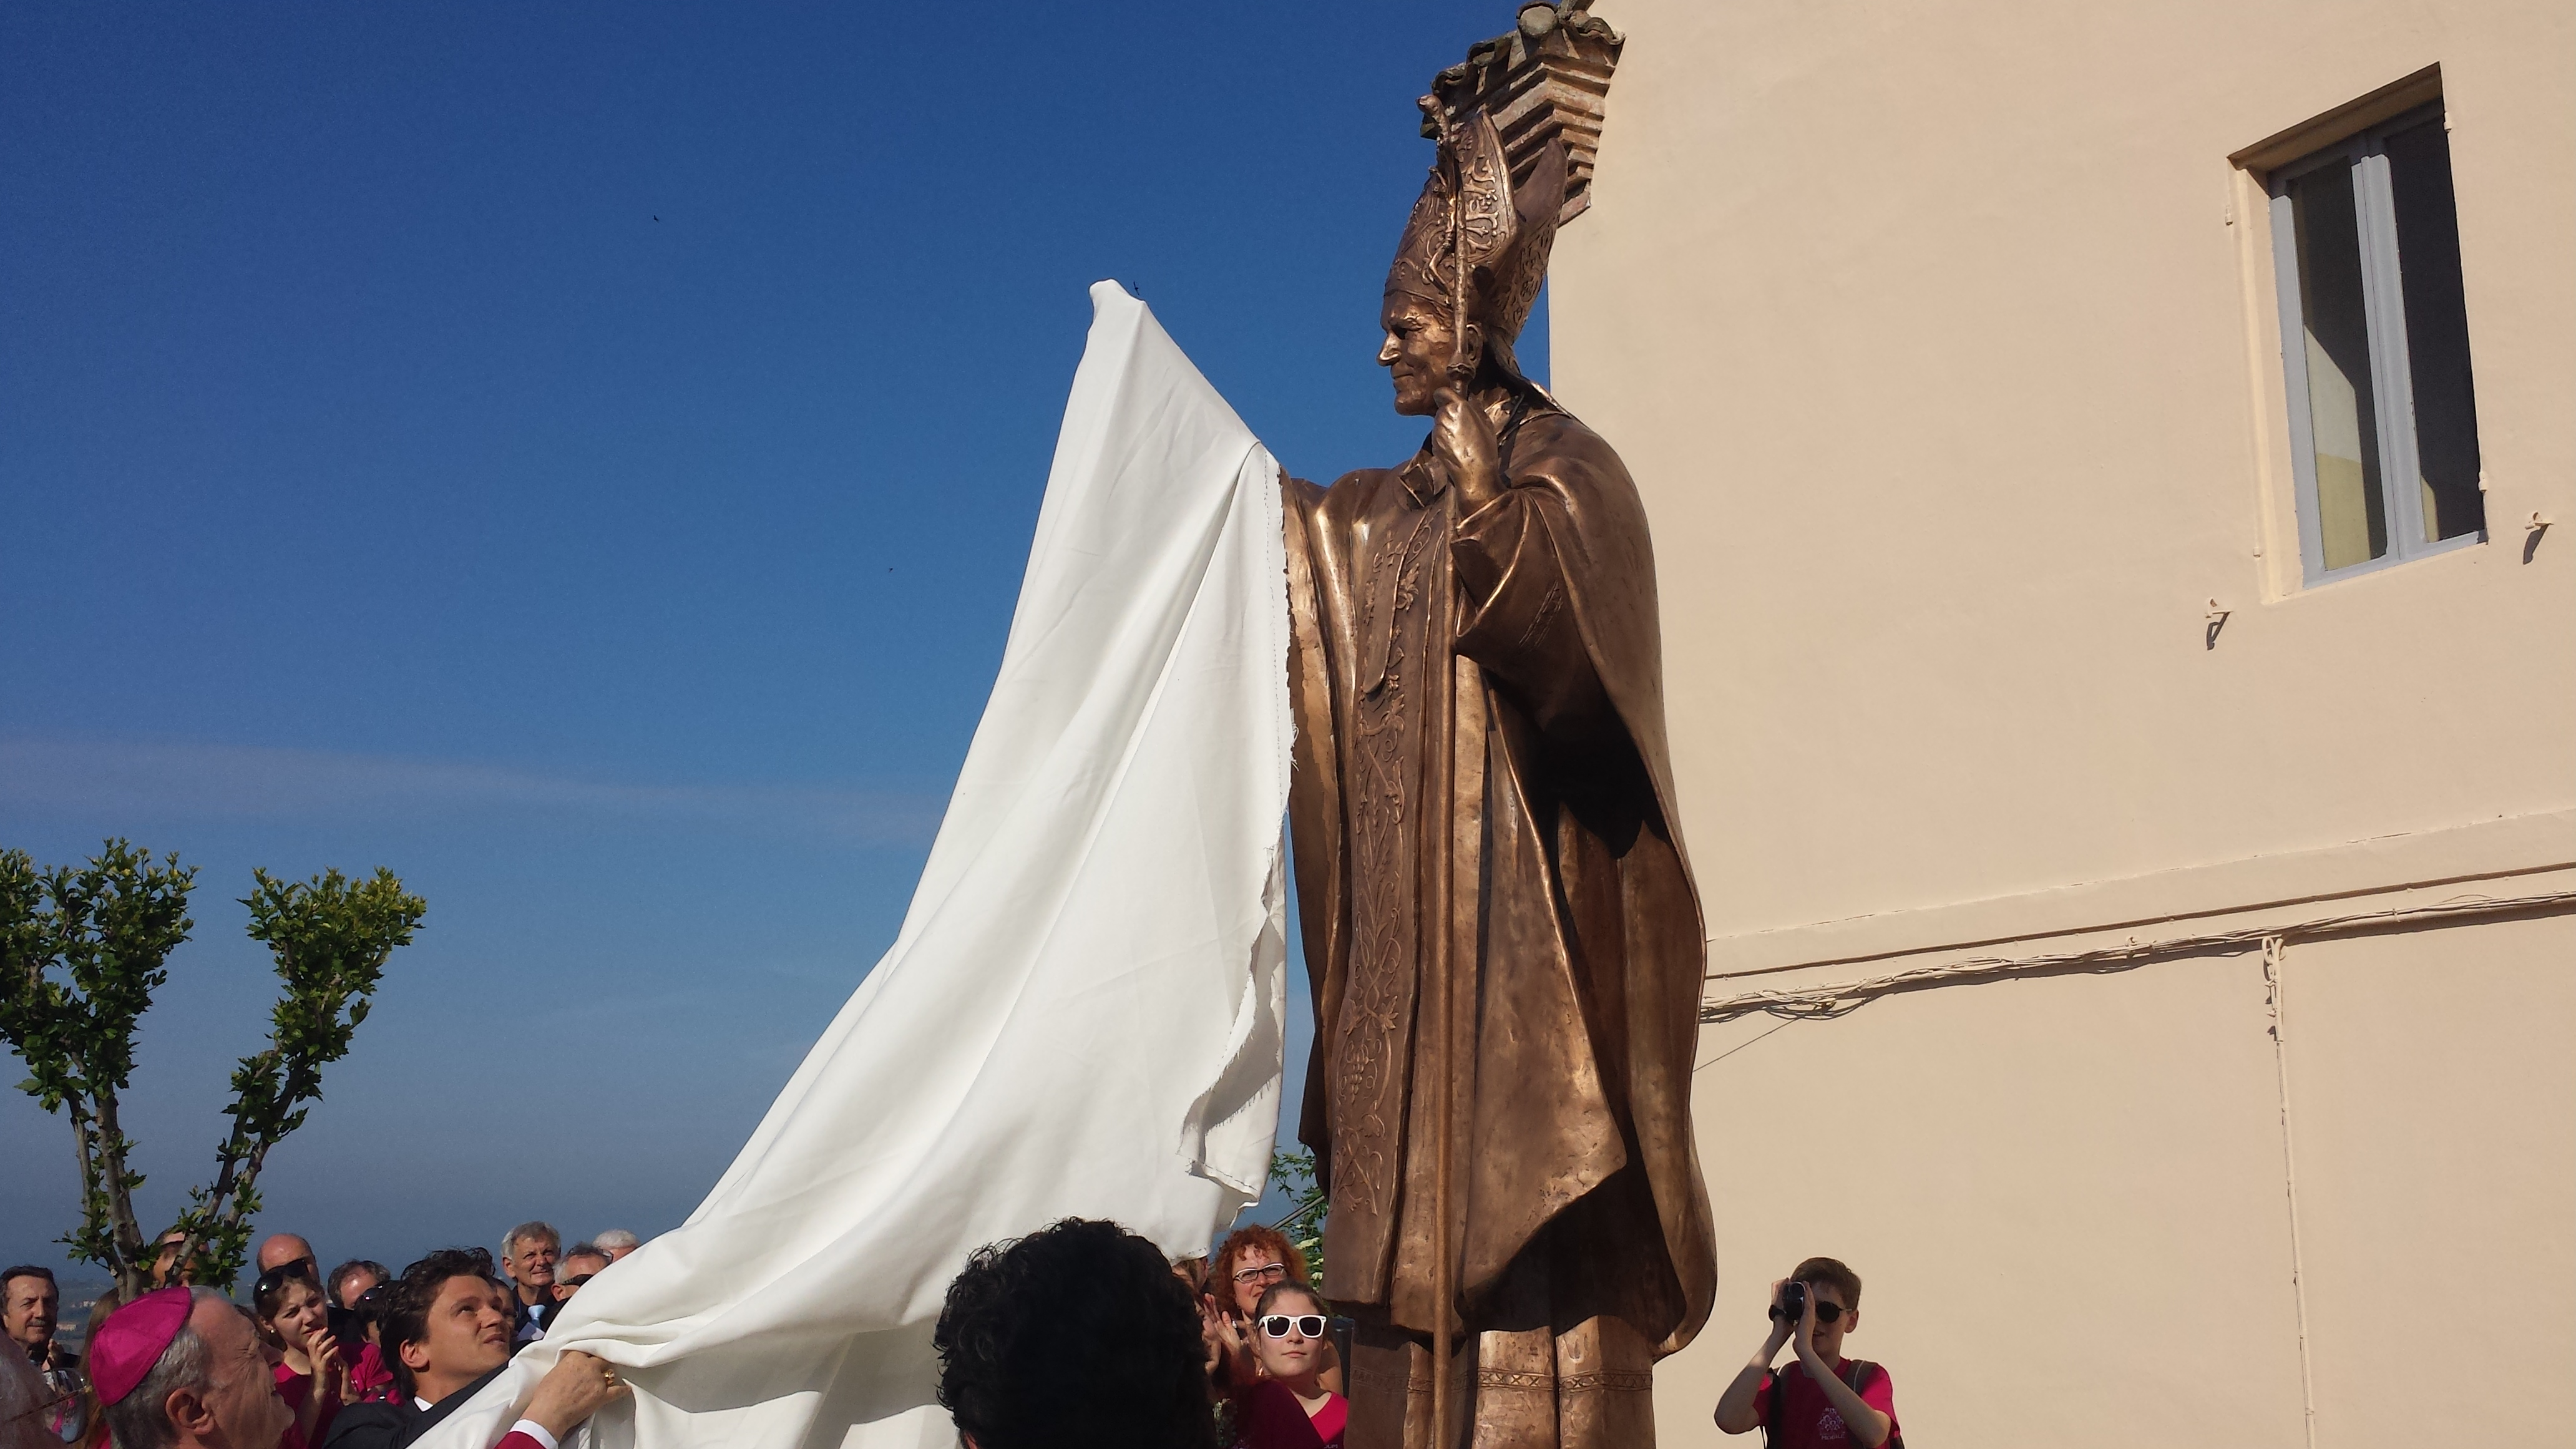 Innagurazione Statua Papa Wojtyla